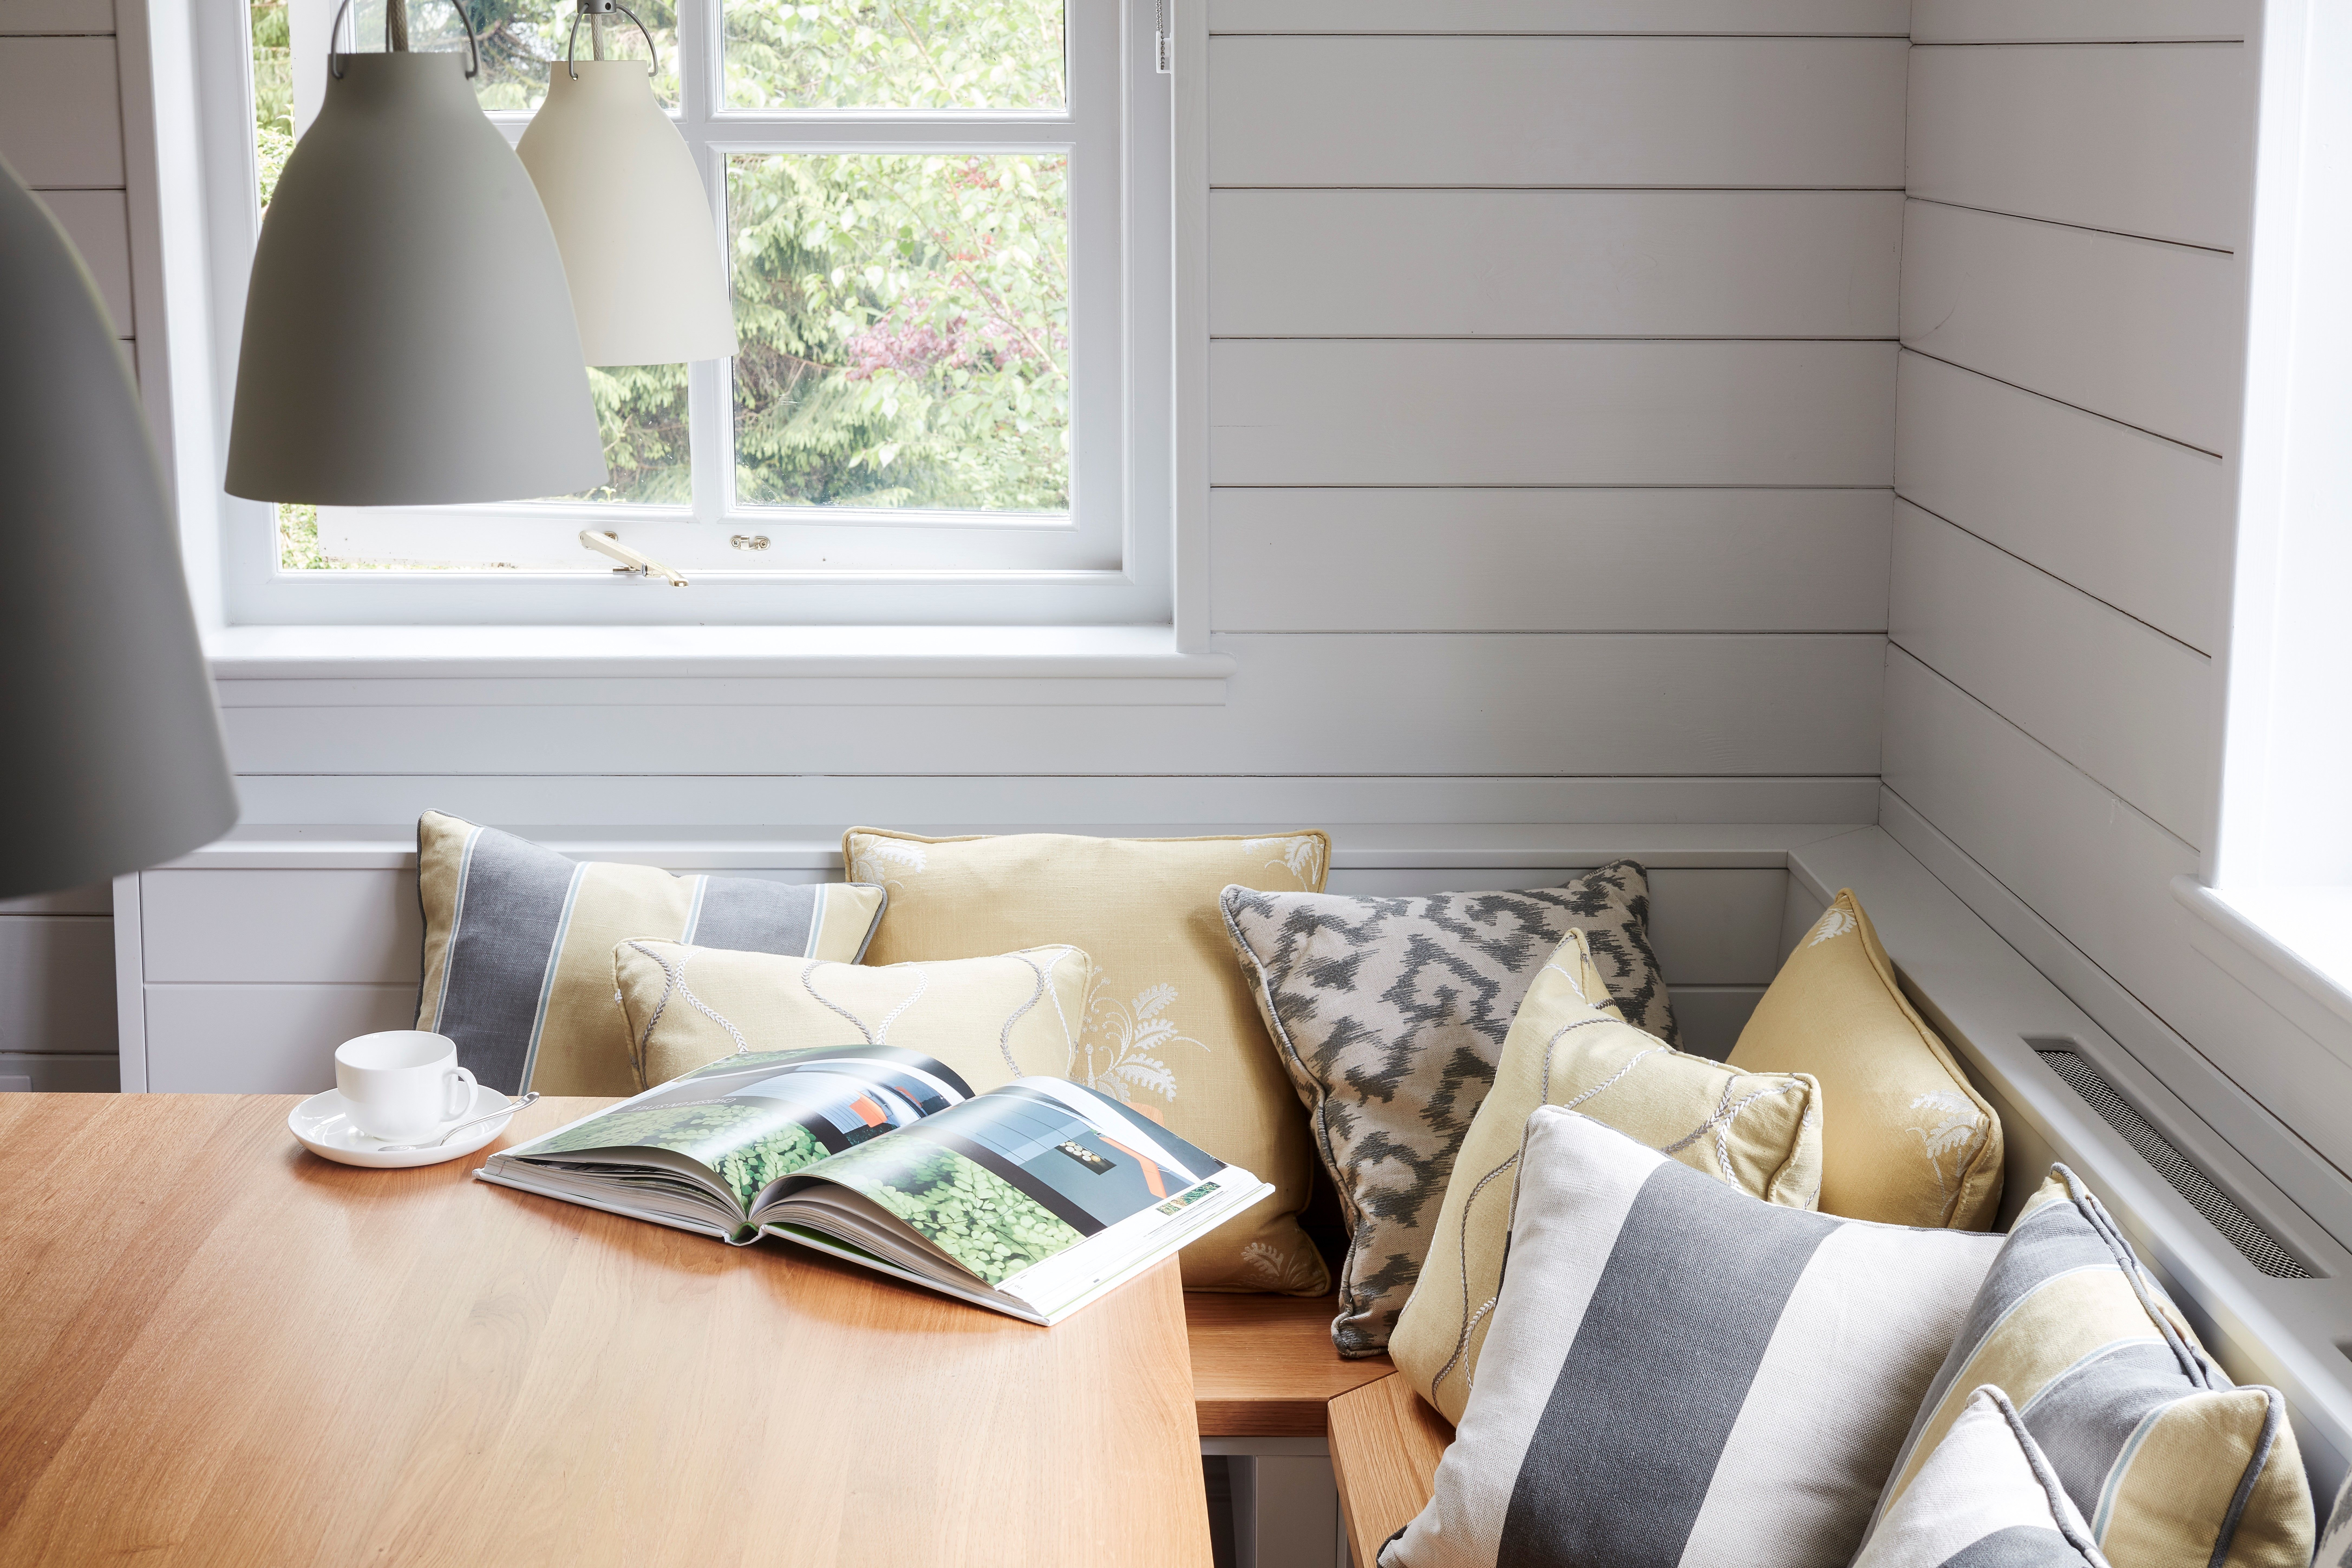 Interior Design Lake District Property Transformed Into